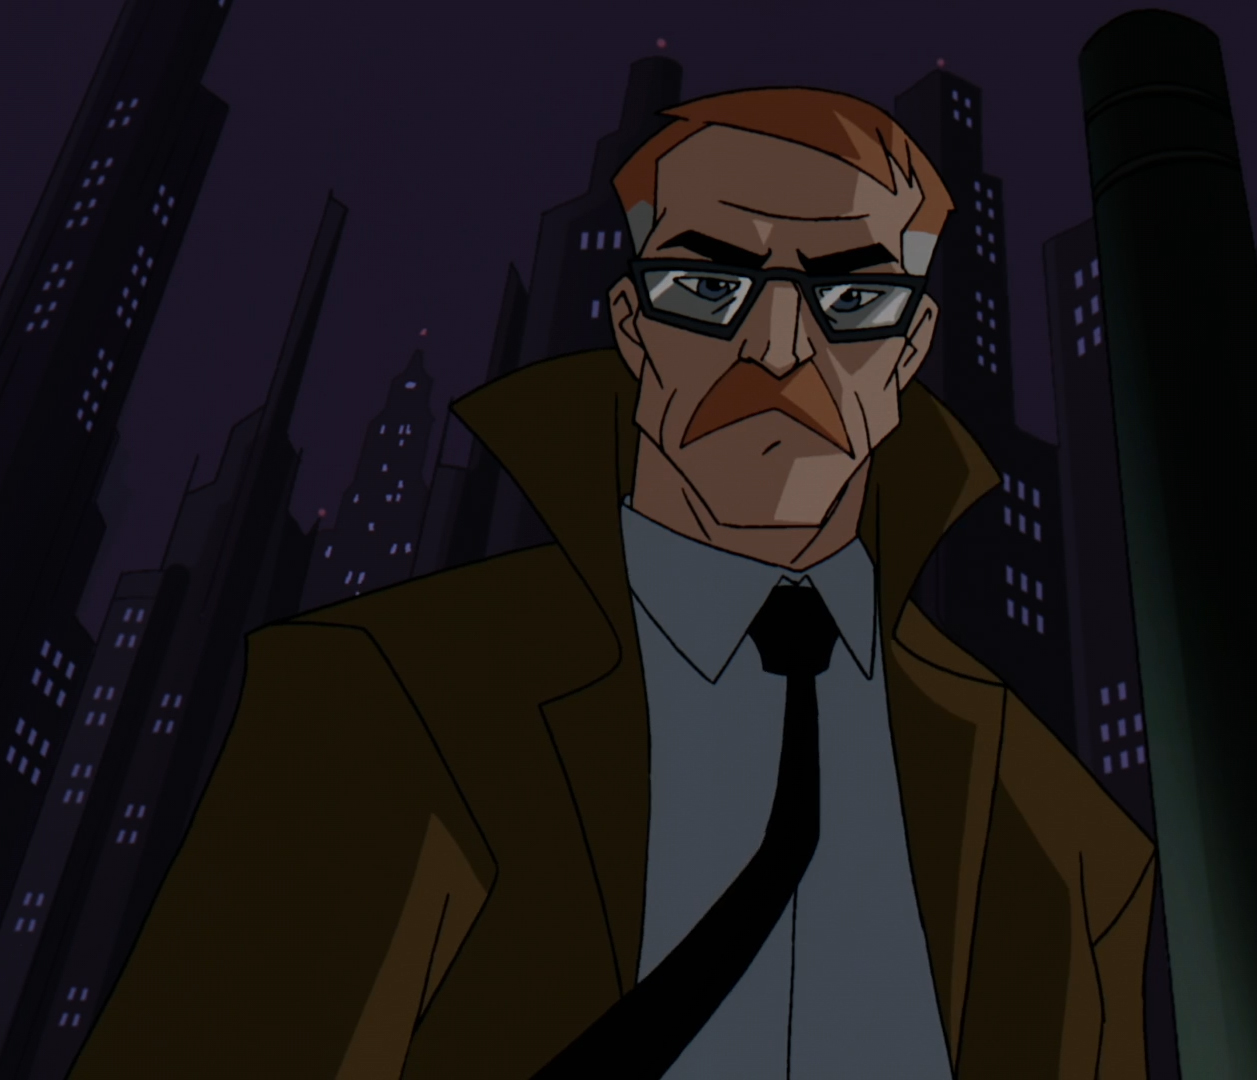 File:Commissioner Gordon - The Batman 01.jpg